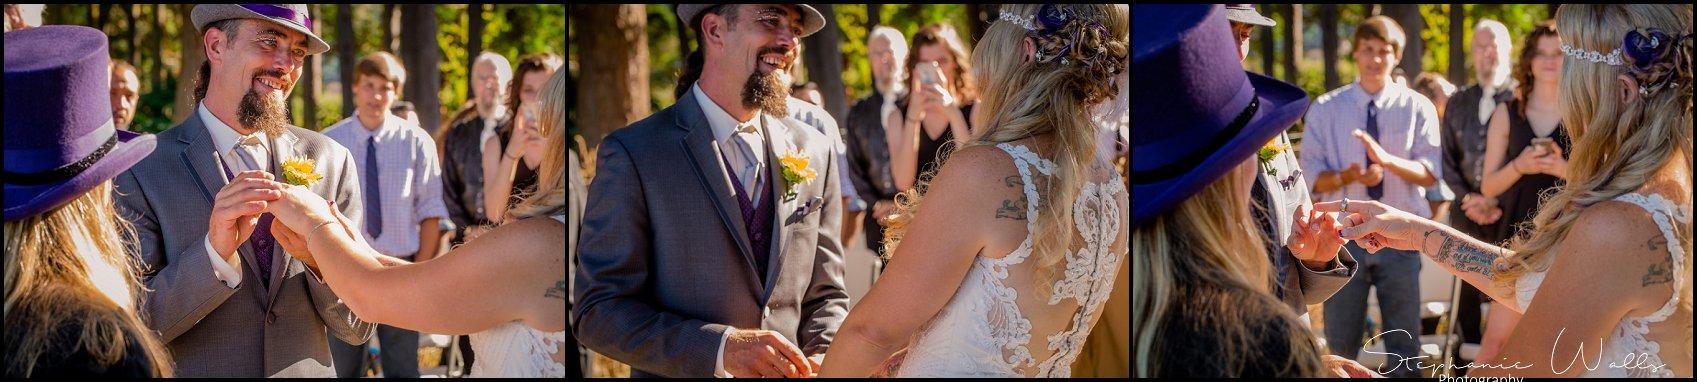 Everist Wedding 236 Patti & Bobbys | Troll Haven Castle & Bandy Farms | Sequim, Wa Wedding Photographer